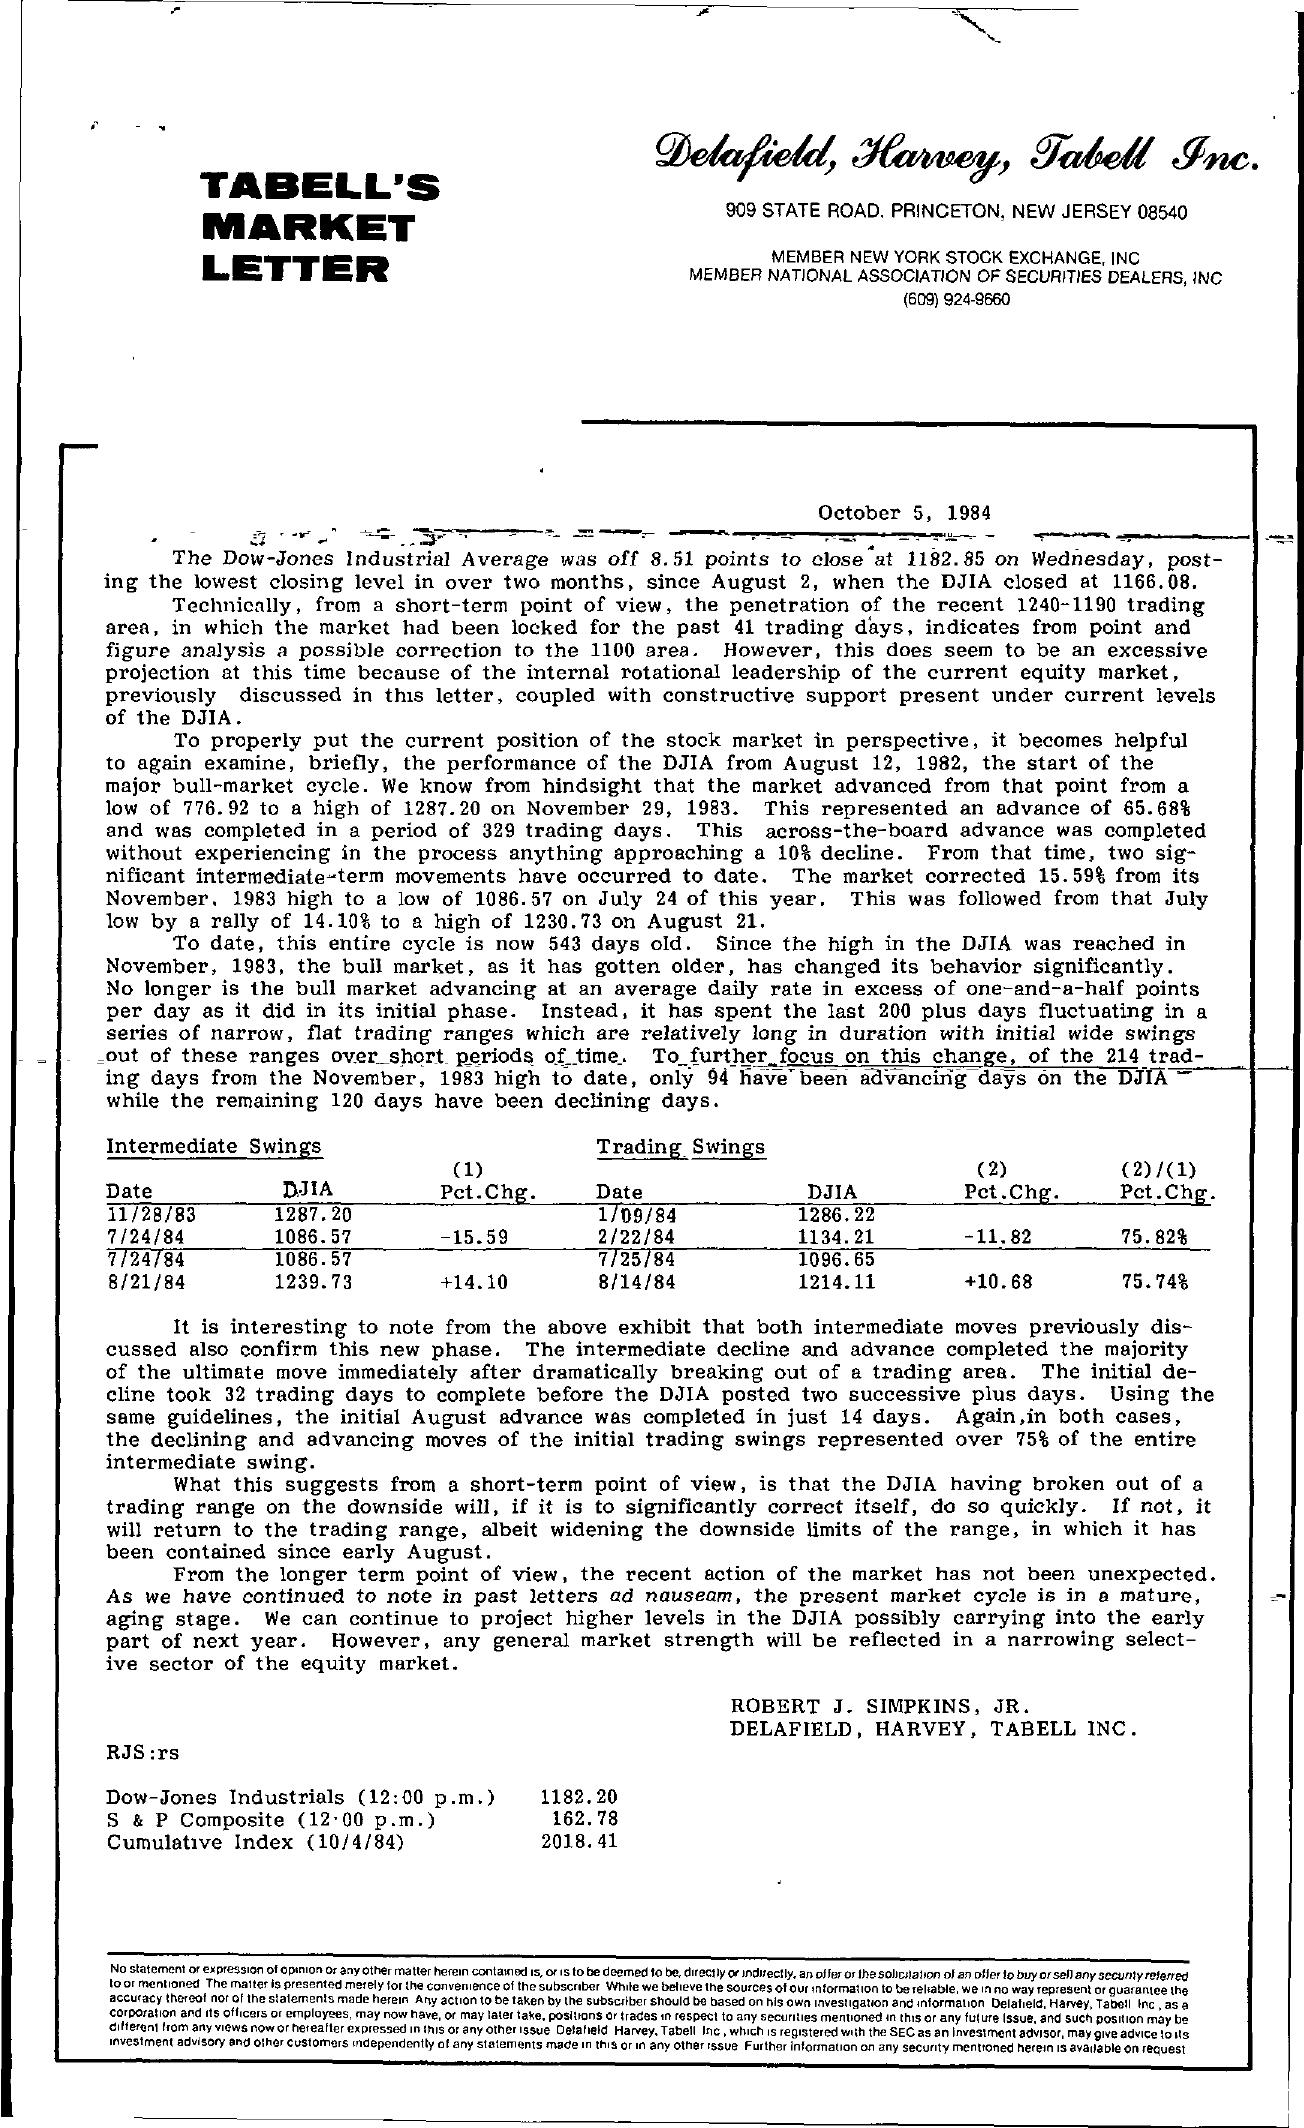 Tabell's Market Letter - October 05, 1984